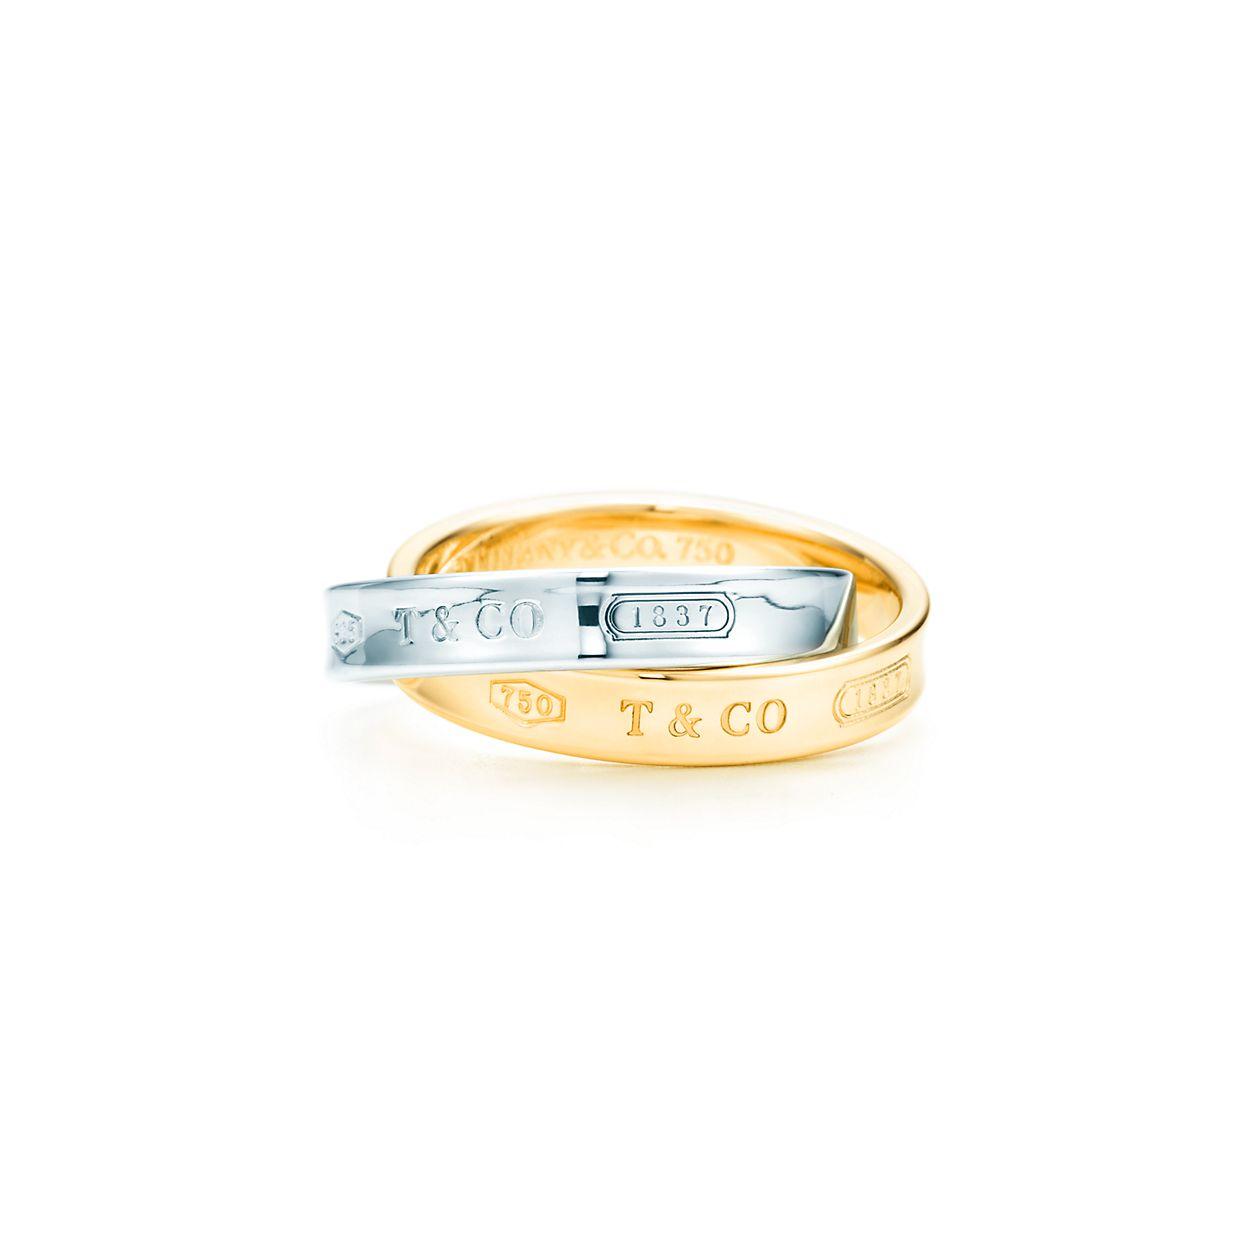 Tiffany 1837 interlocking circles ring in sterling silver - Size 6 Tiffany & Co. ek0f4Ytf5